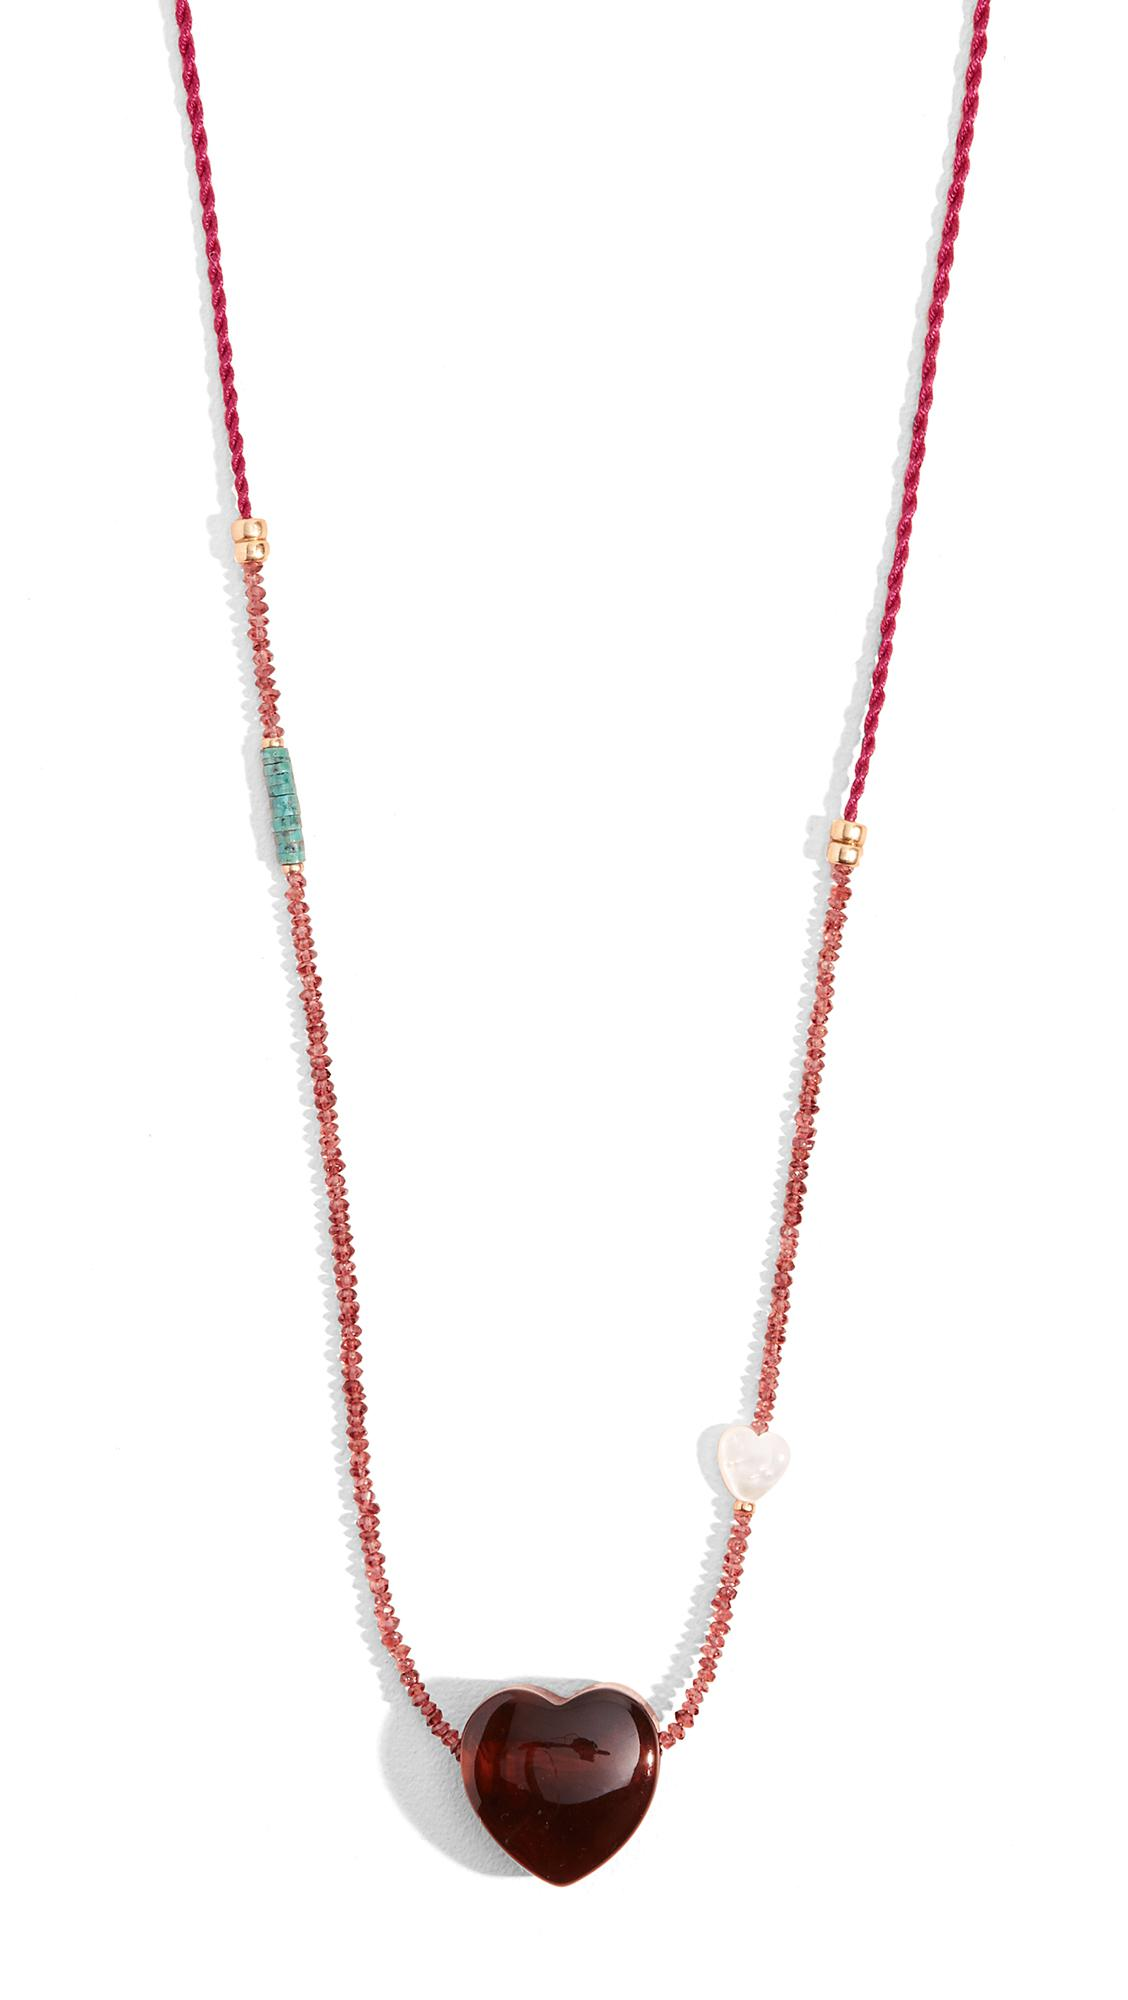 Lizzie Fortunato Gemini Necklace In Tortoise/Magenta